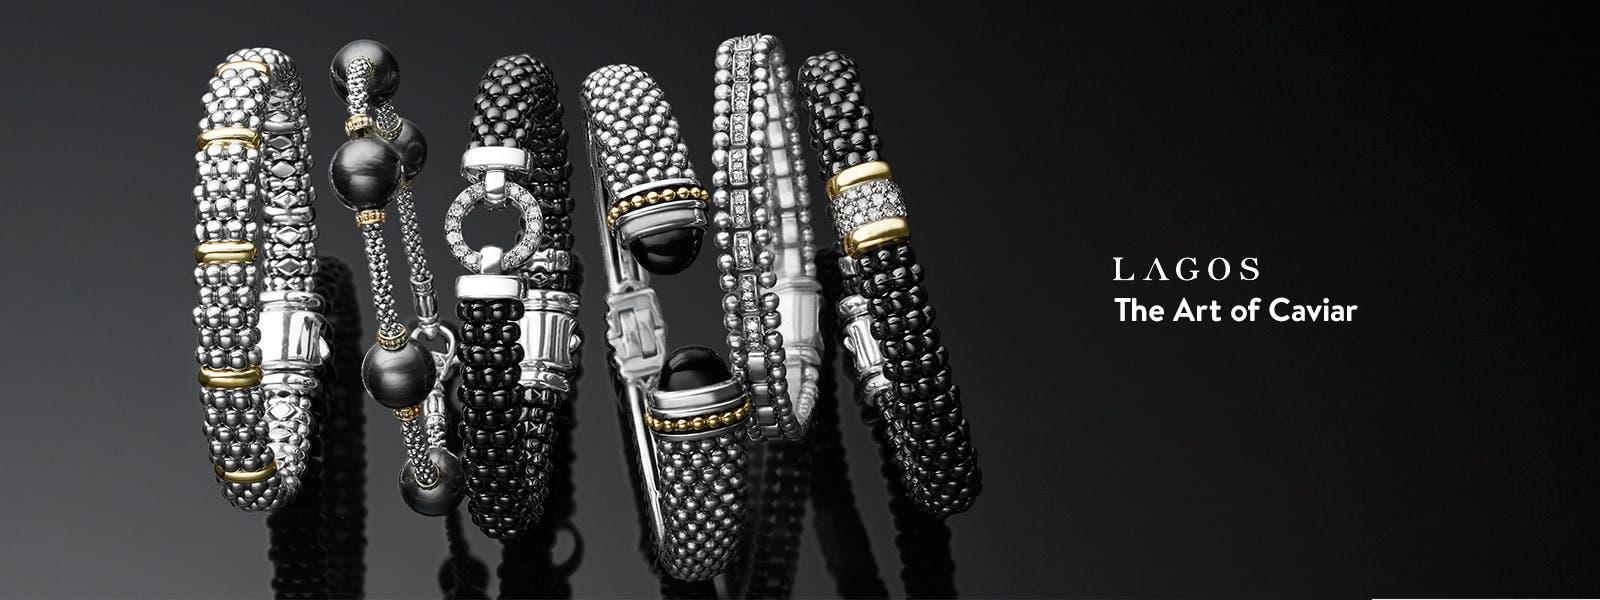 The art of caviar.